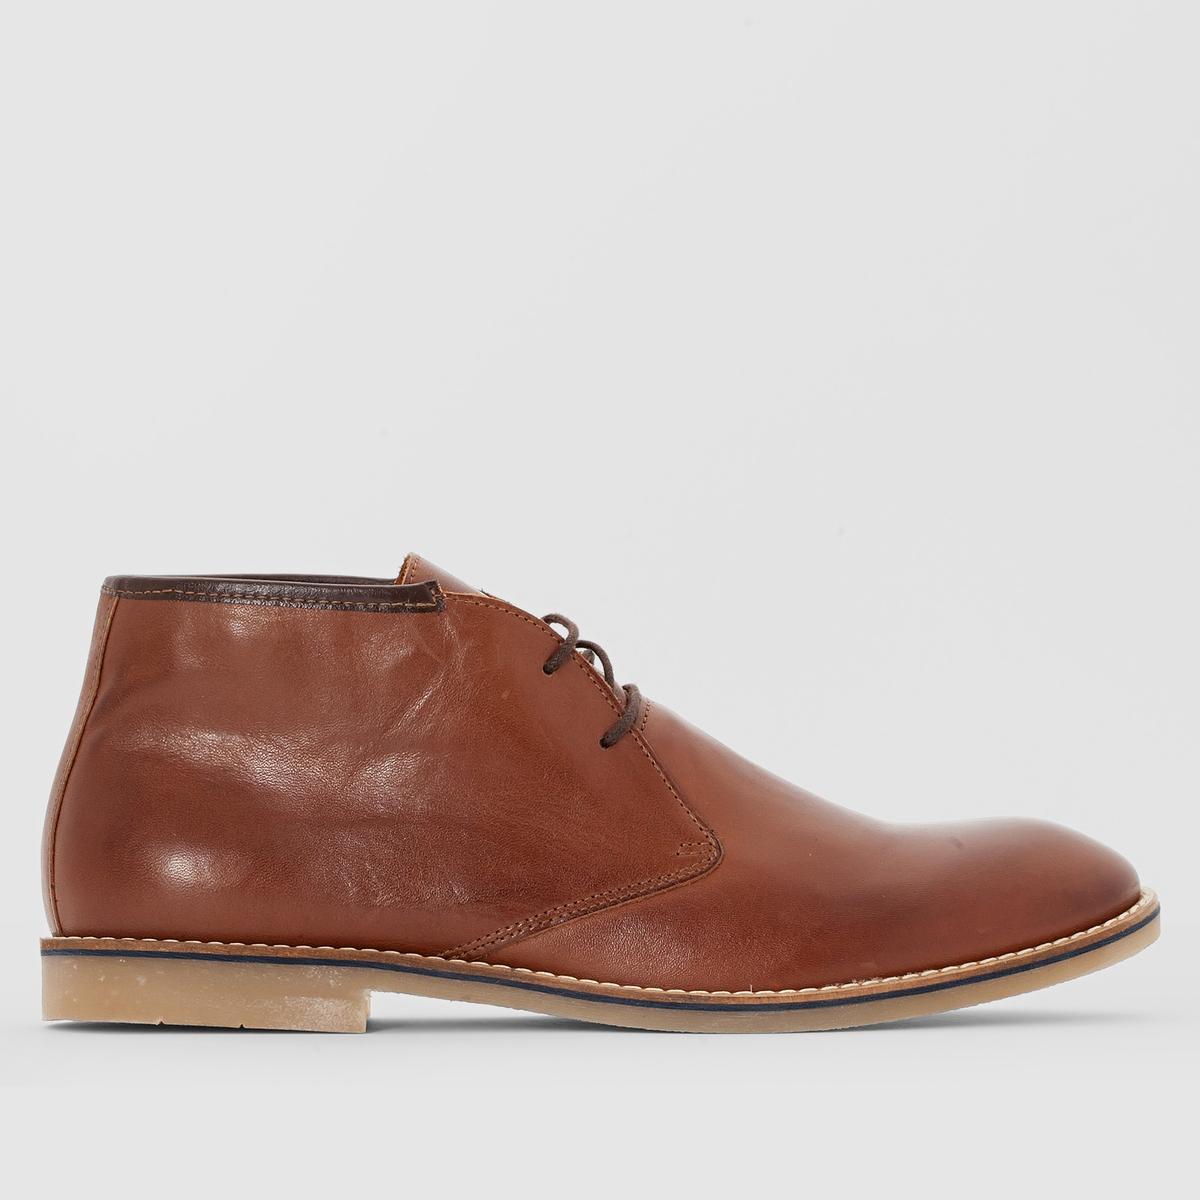 Ботинки кожаные на шнуровке Chah 16 от La Redoute Collections